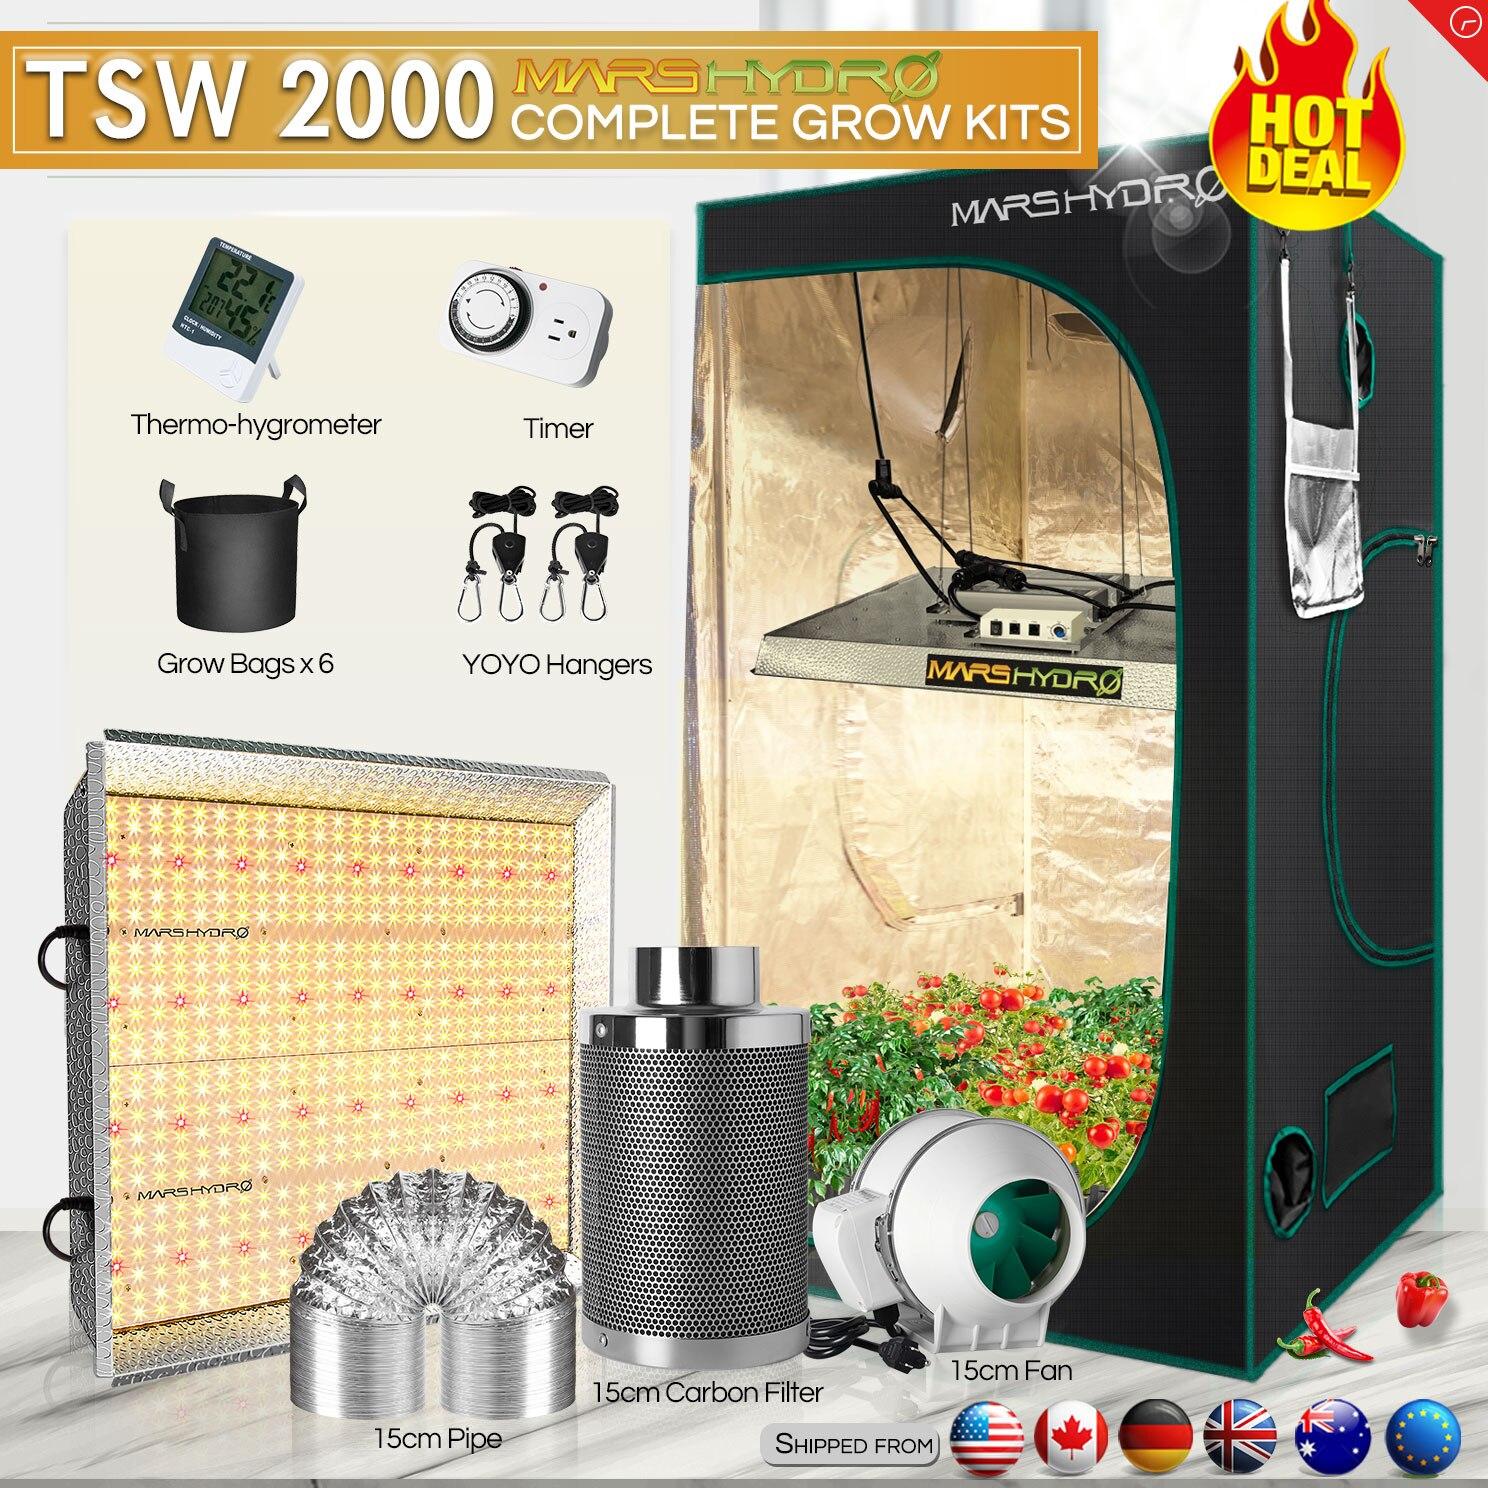 New! Mars Hydro TSW 2000W Grow Kits LED Light Sunlike Full Spectrum for Veg and Bloom Hydroponics